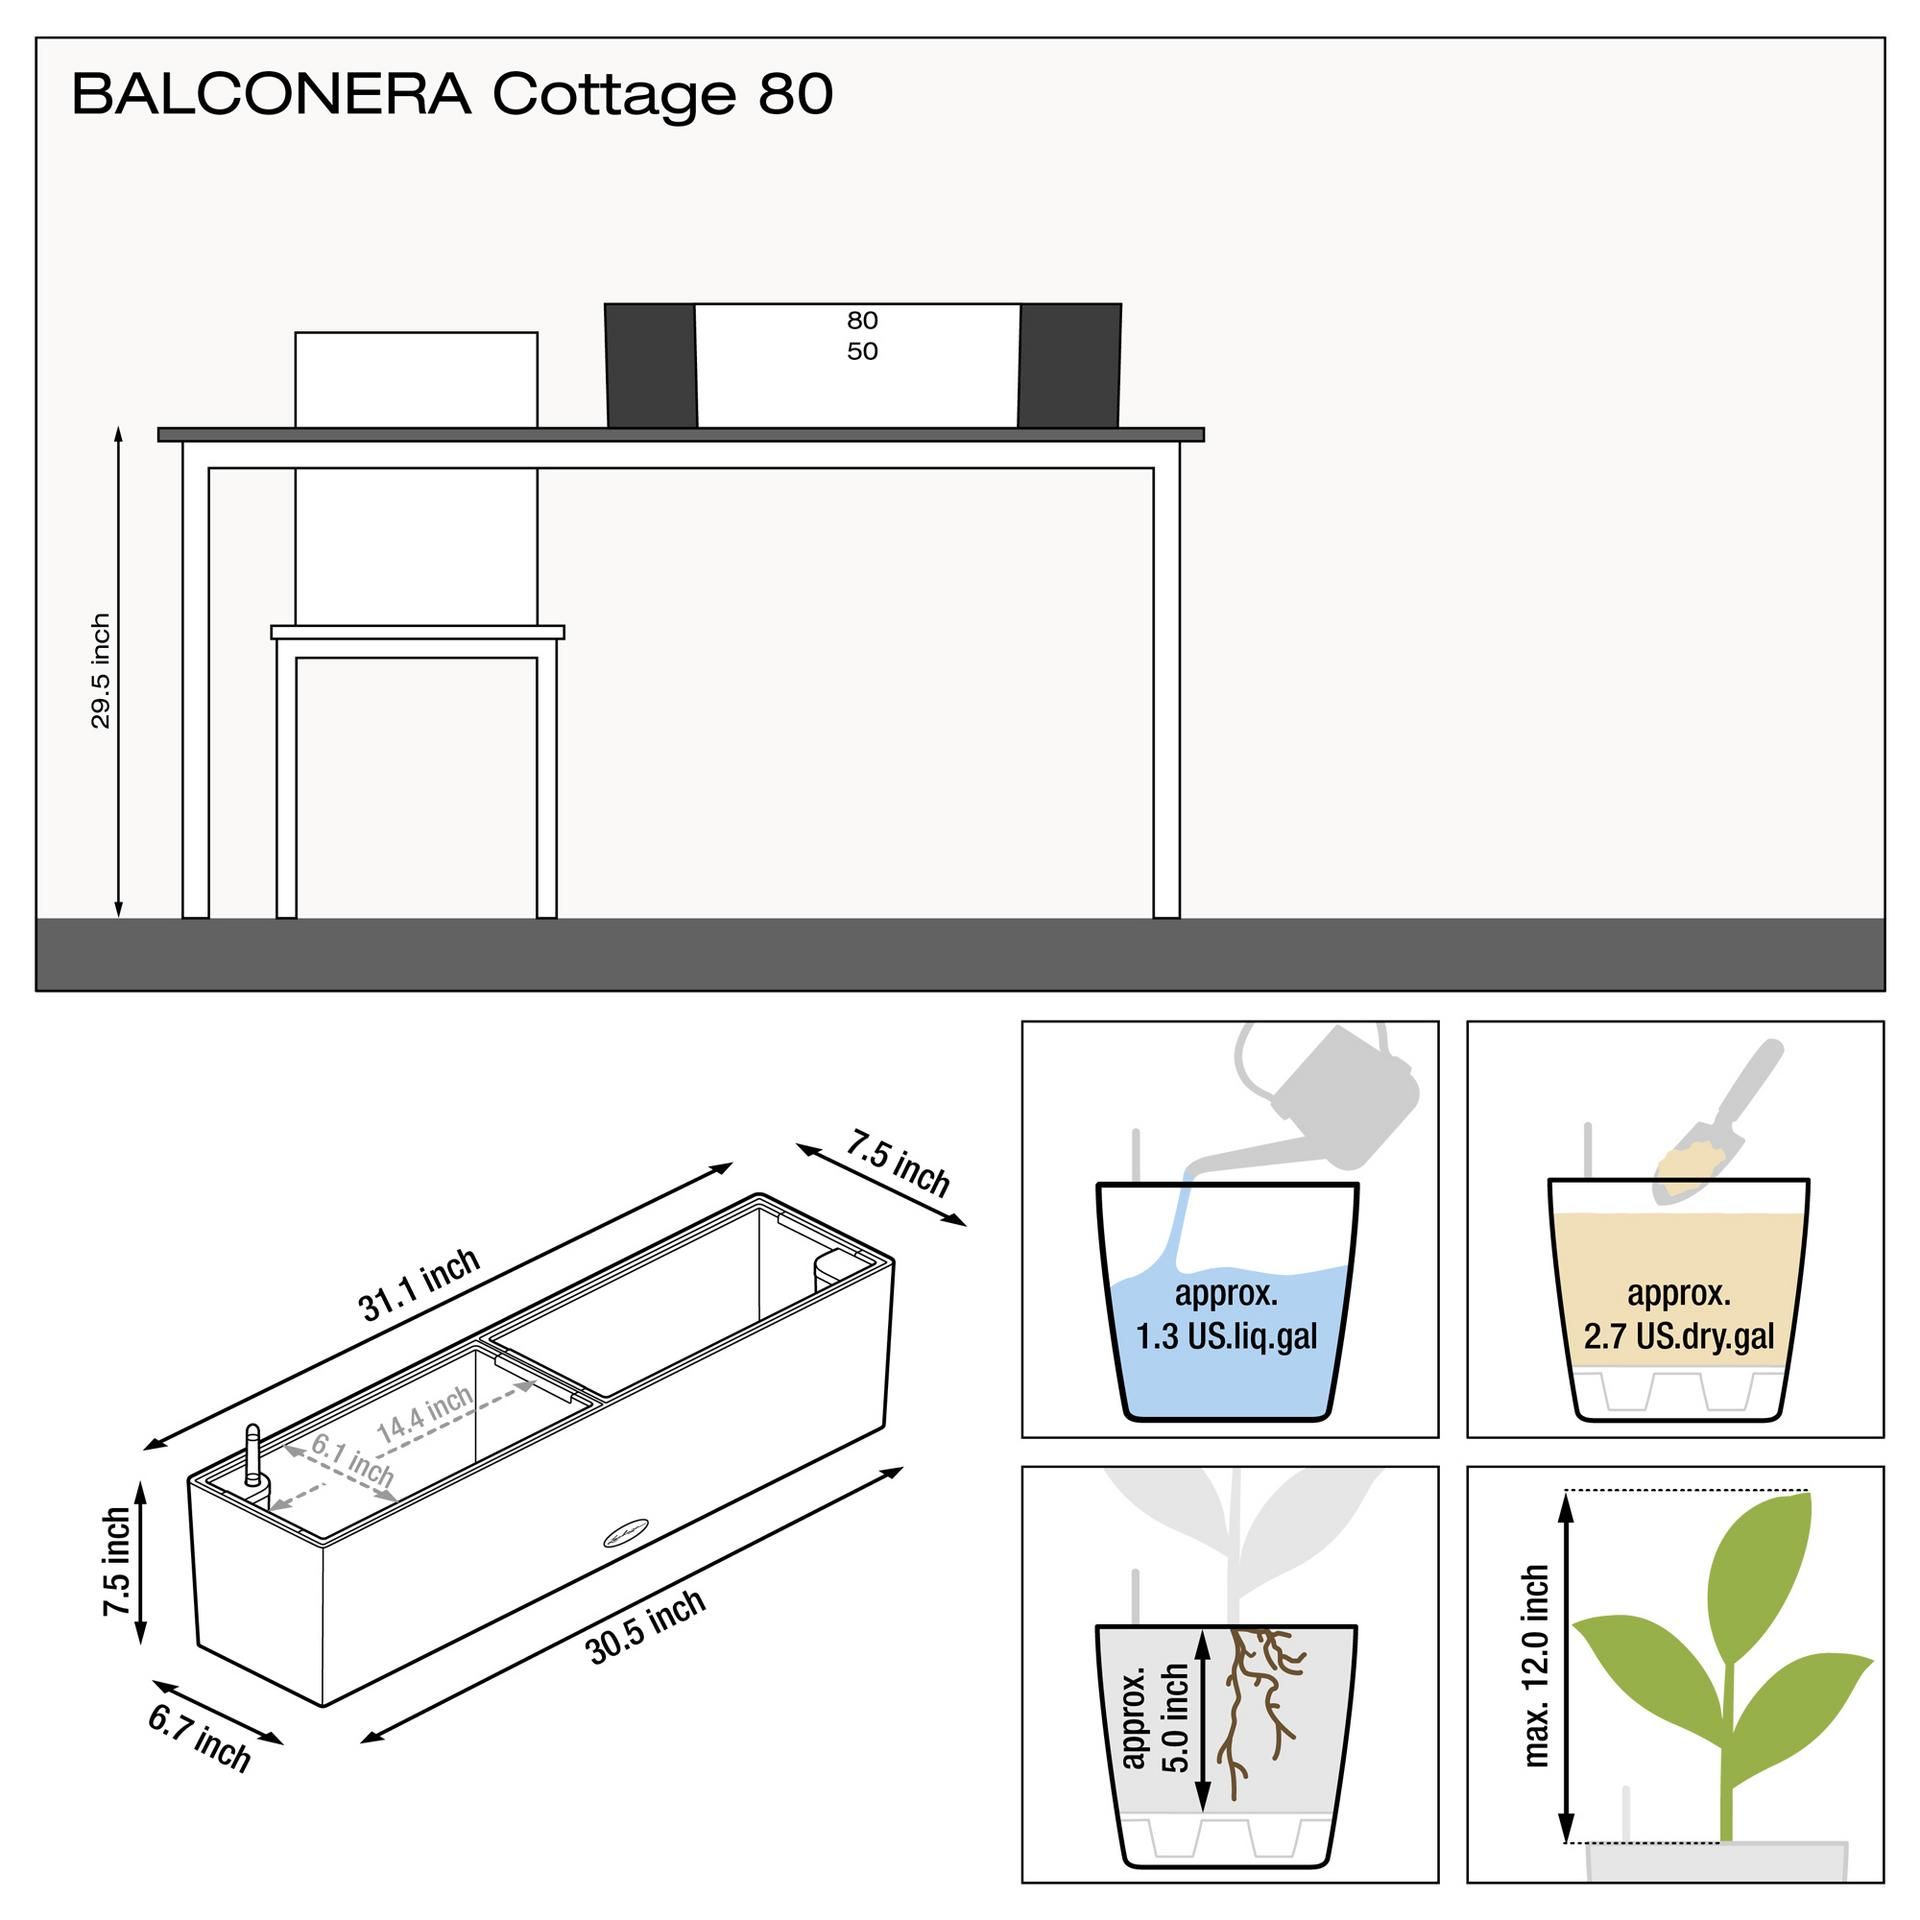 le_balconera-cottage80_product_addi_nz_us